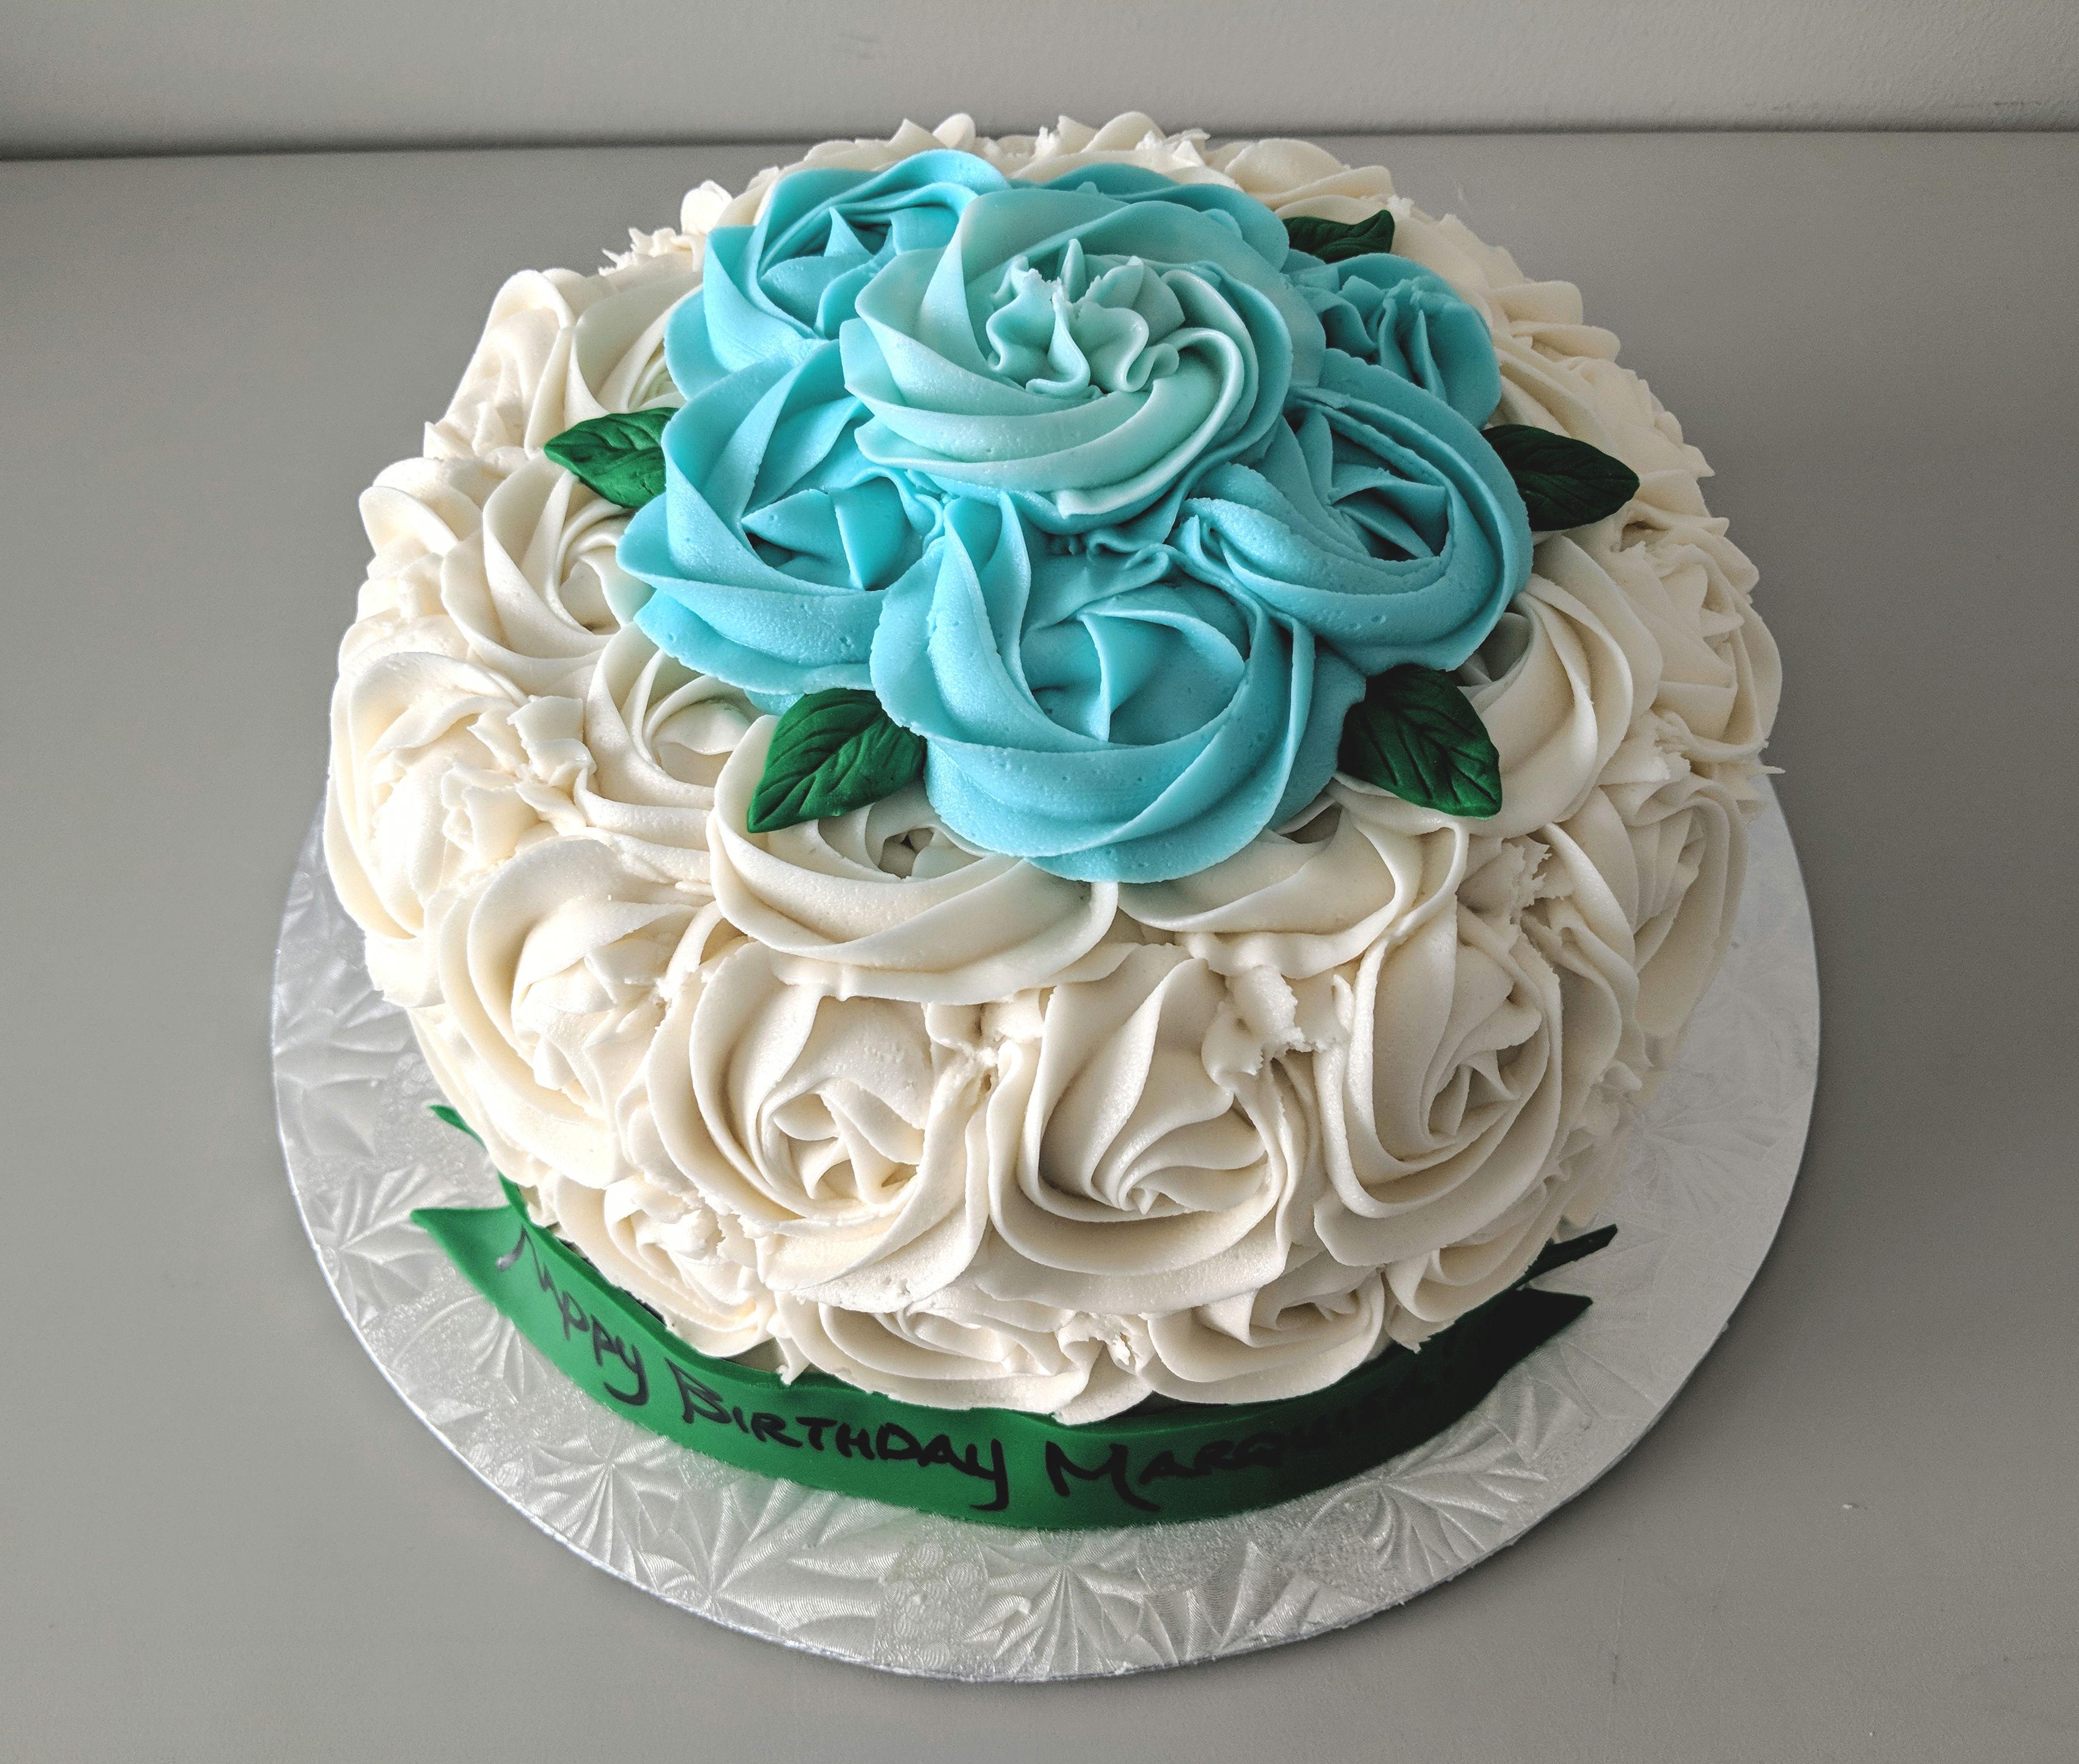 Rosette and Leaves Cake